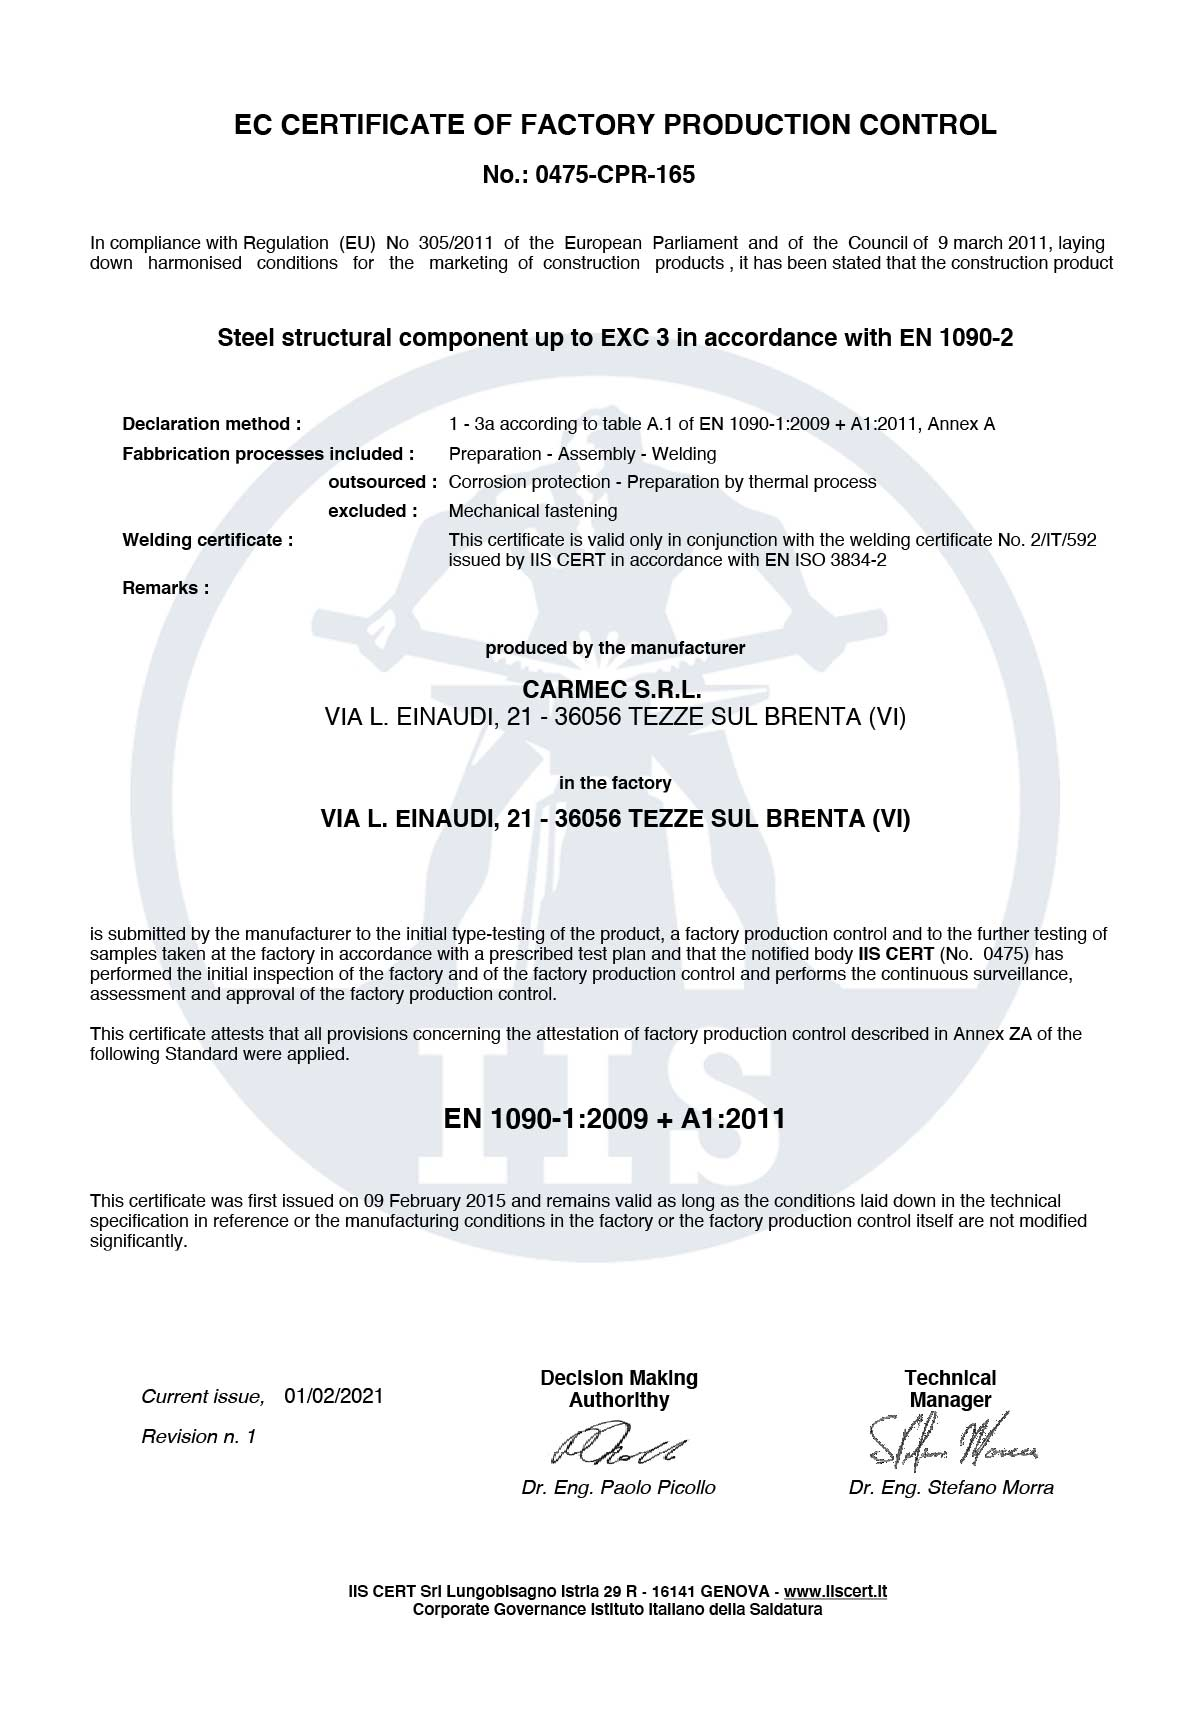 Cramec Srl ISO 9001 2015